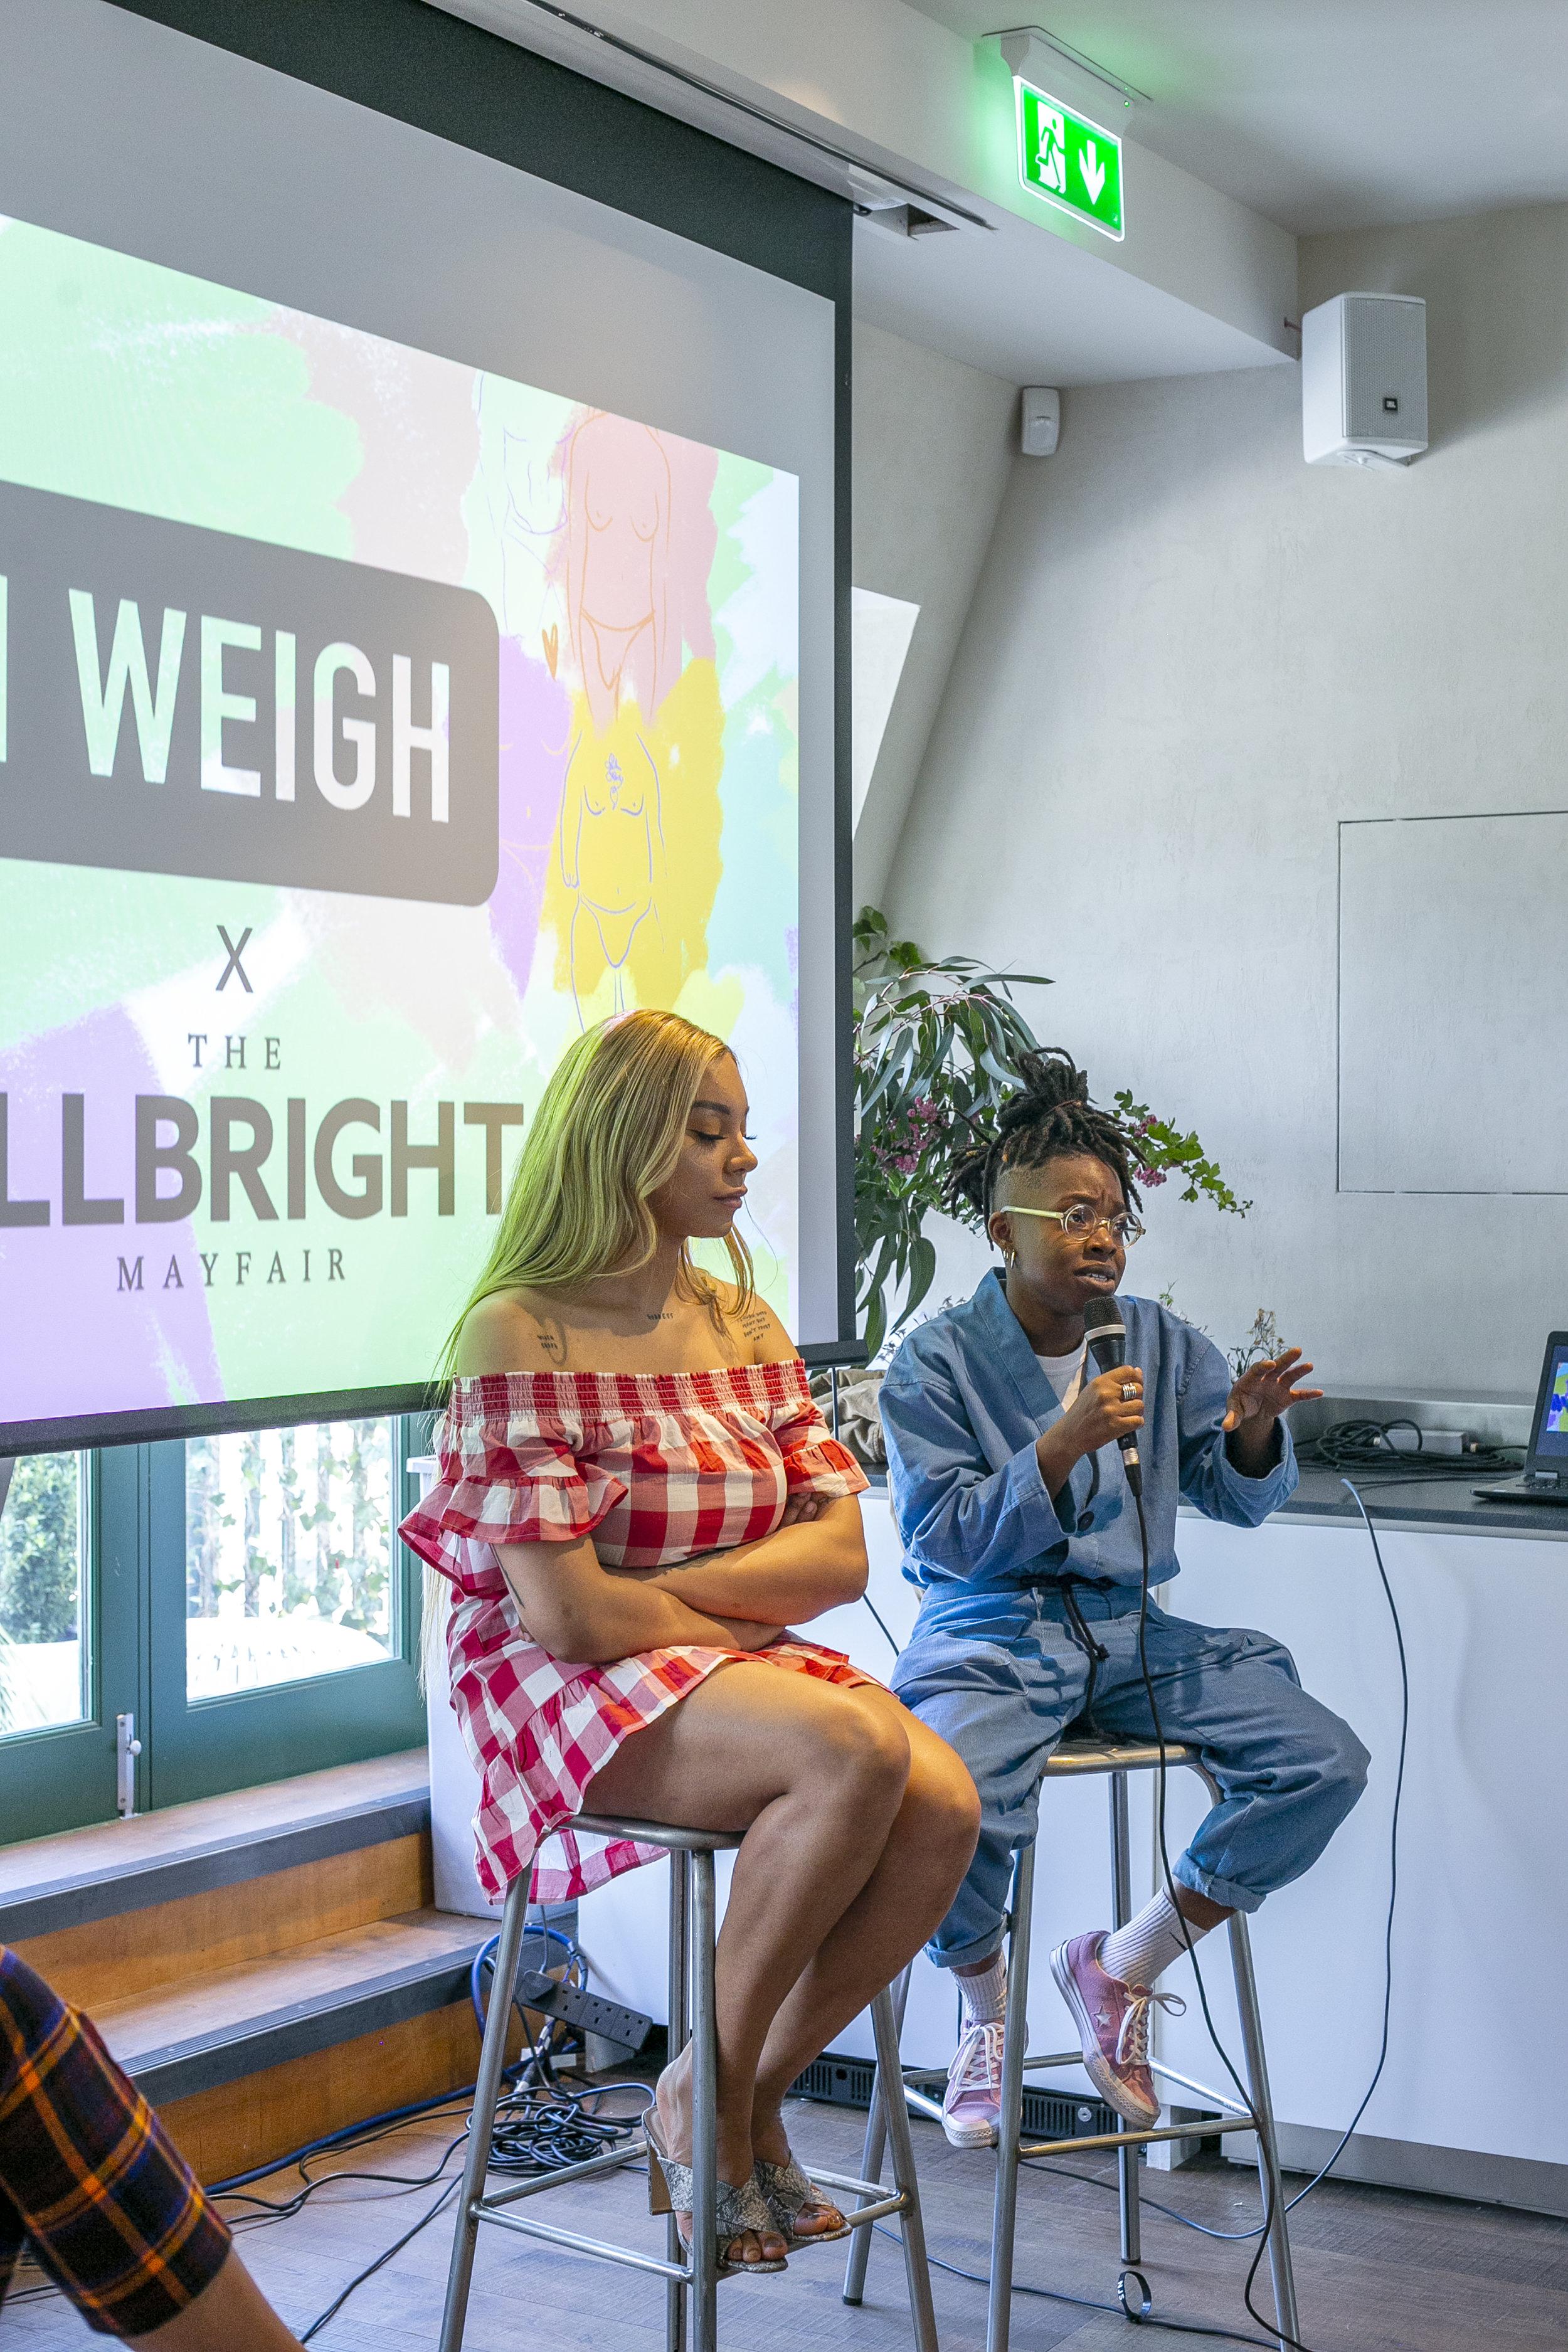 I Weigh 78_High Res.jpg